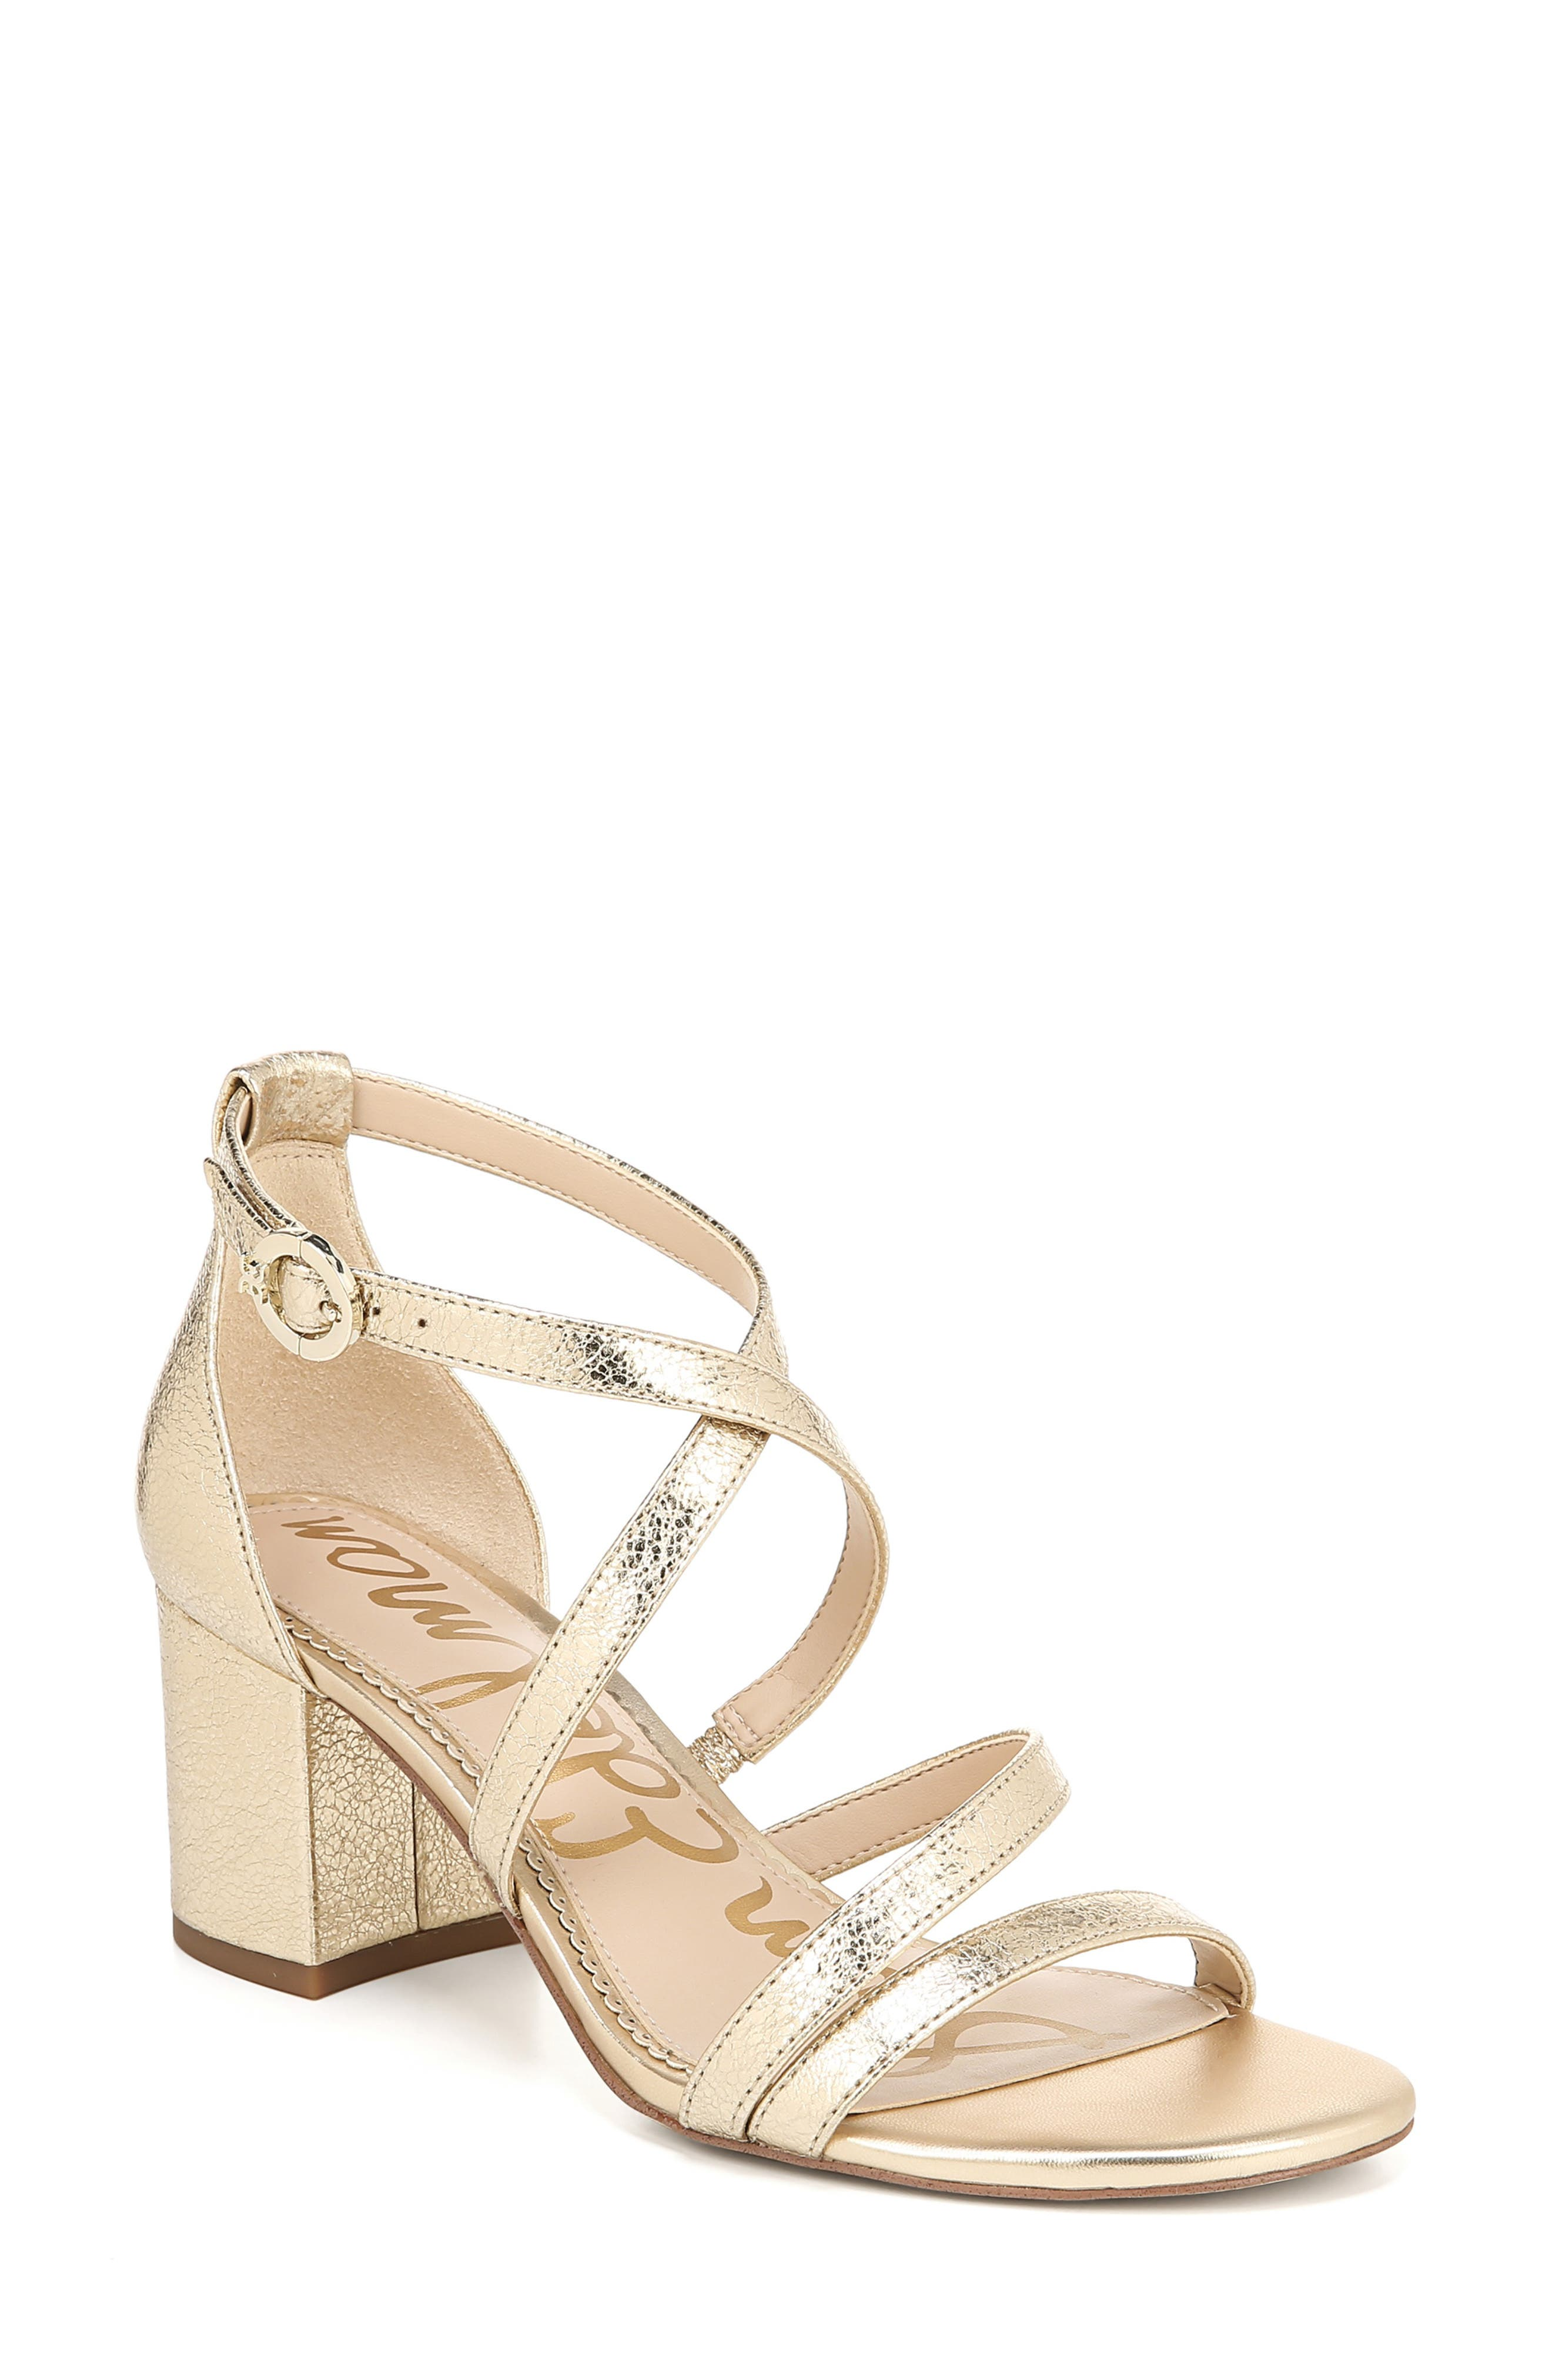 Sam Edelman Stacie Sandal- Metallic